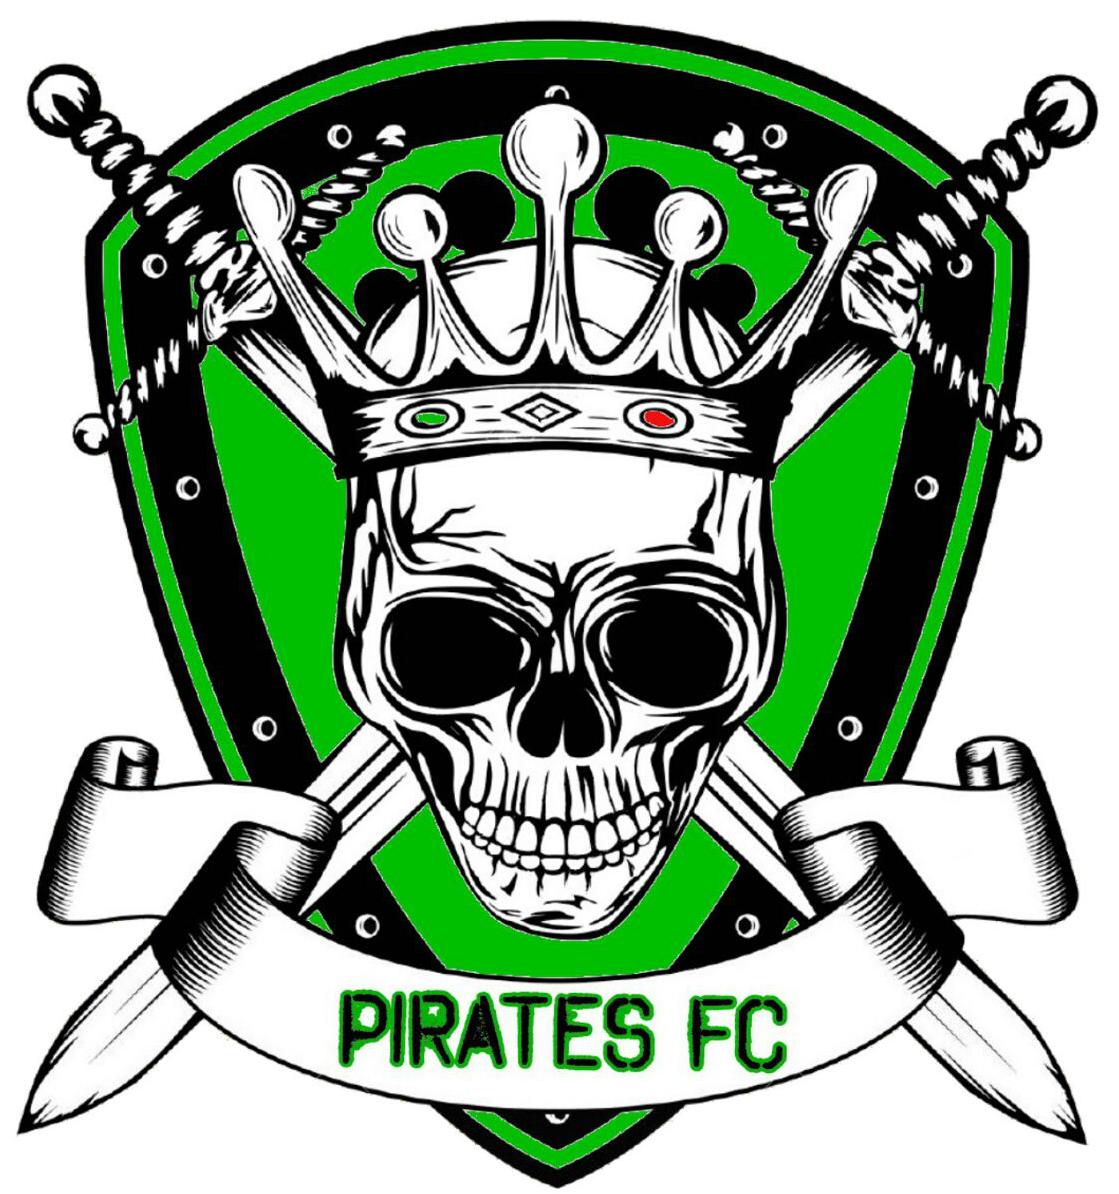 Pirates FC